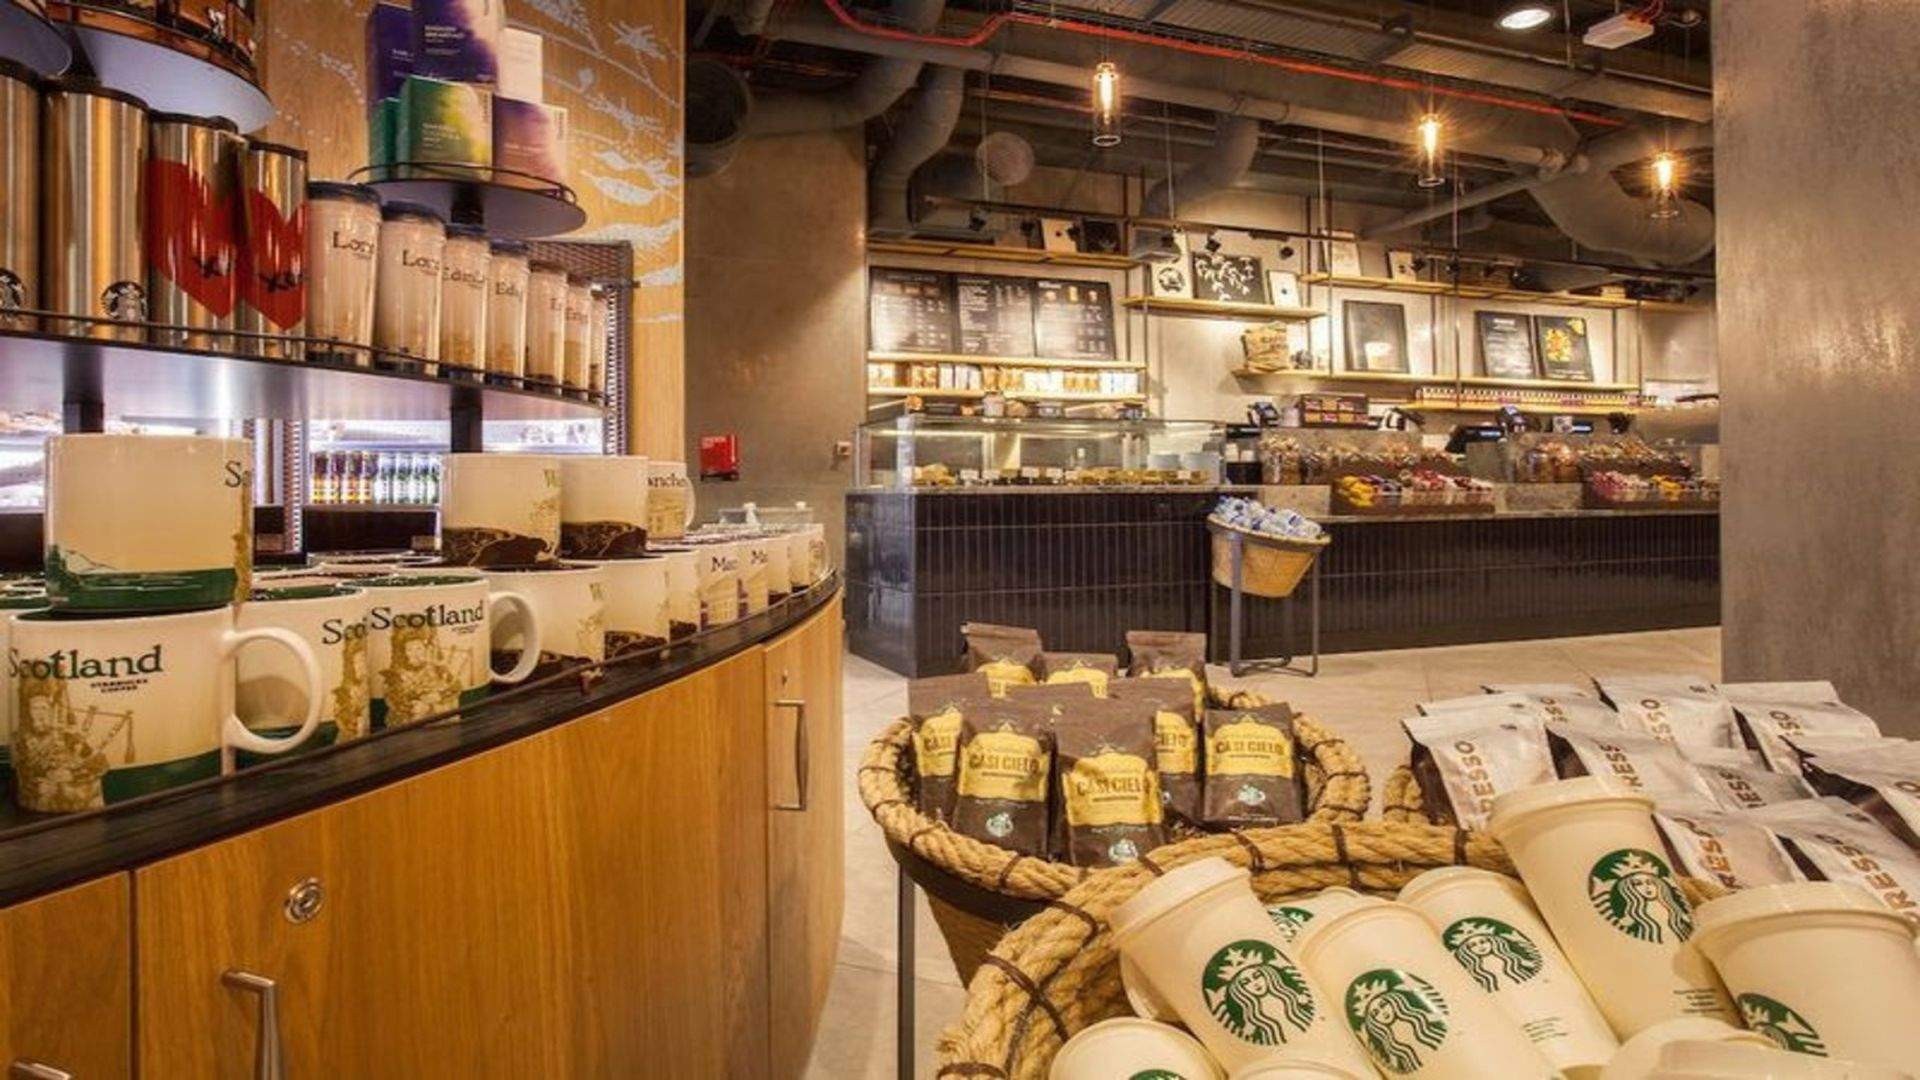 Reusable cups at Gatwick. Photo: Zute Lightfoot/Starbucks